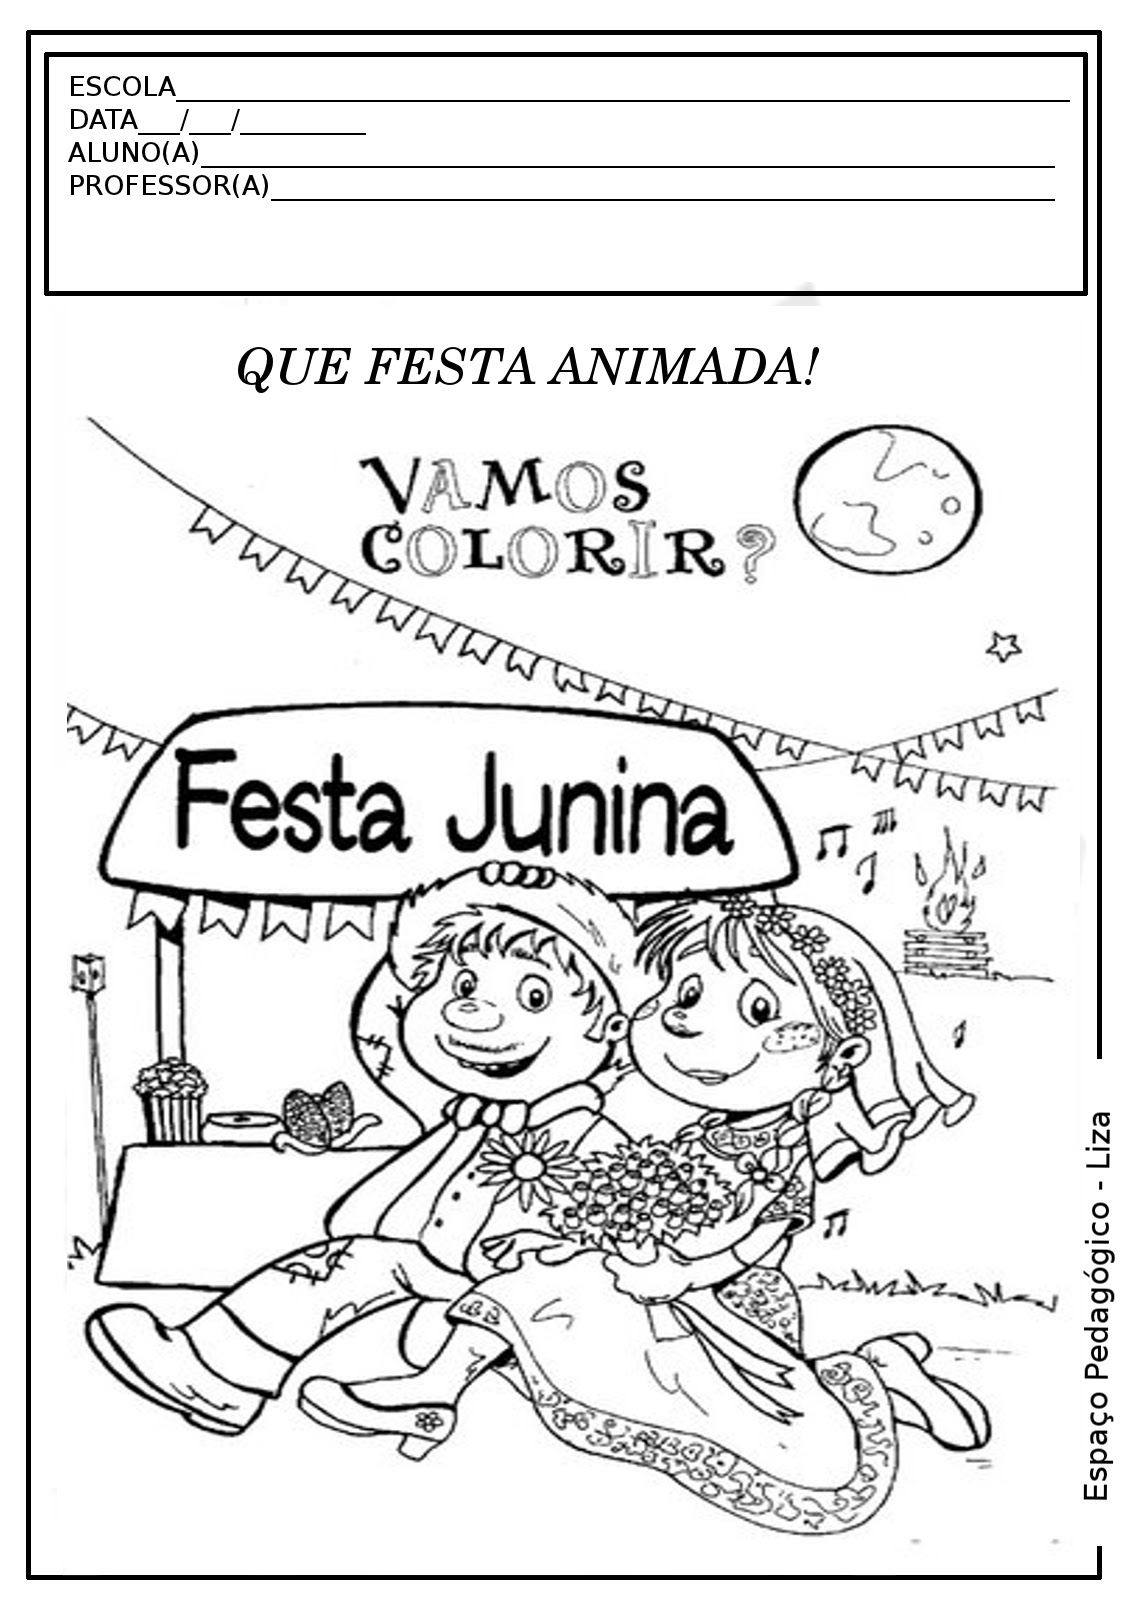 Festa Junina Atividade Colorir Pintar Imprimir Pedagogia